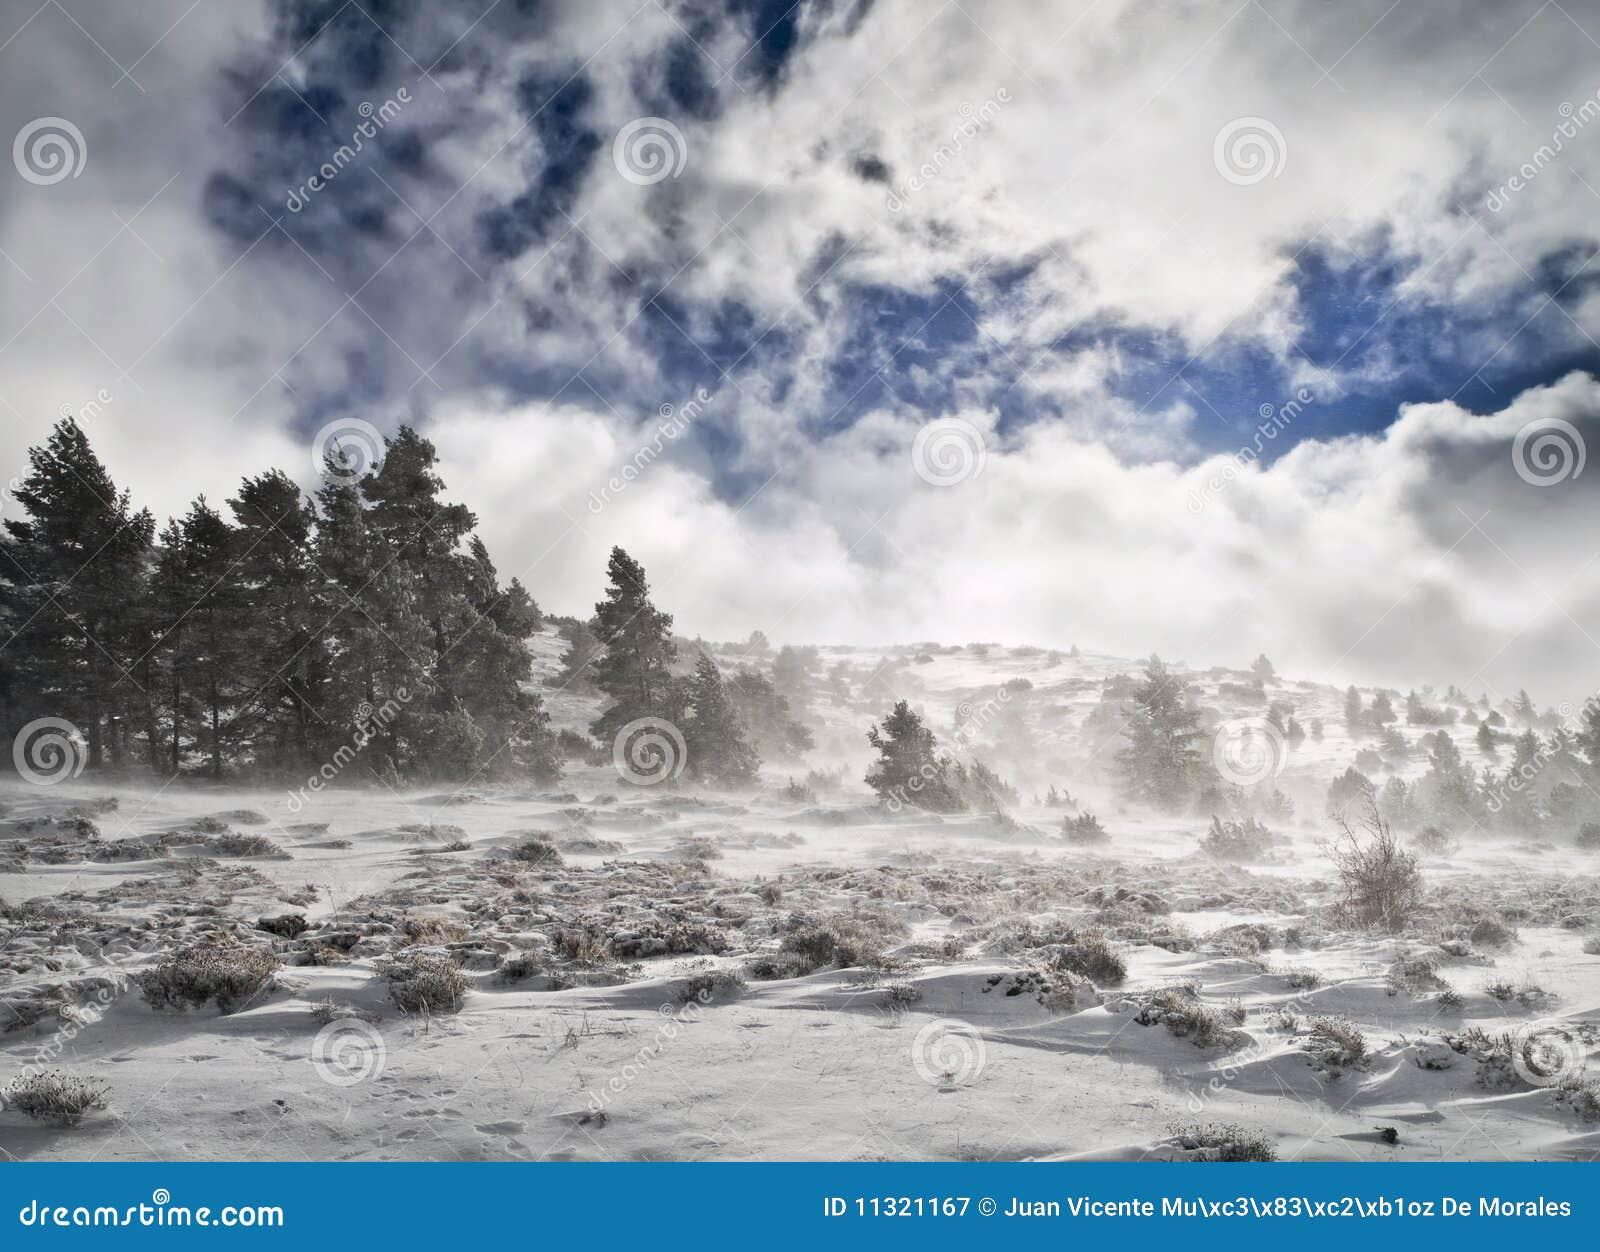 Snowy-Landschaft